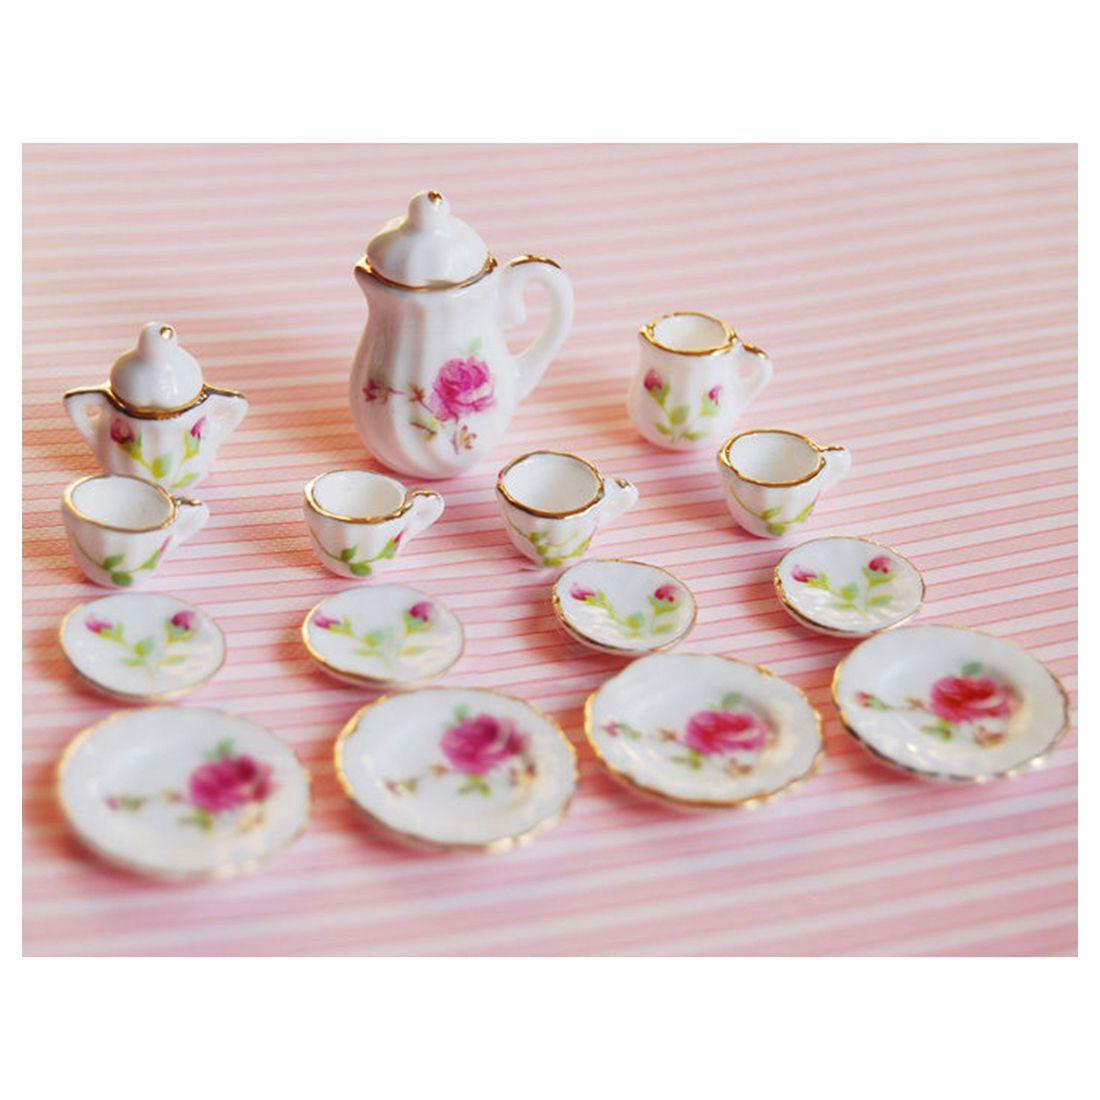 1/12 Scale Dollhouse Miniatures Porcelain Coffee Tea Cups Dishes 15PCS